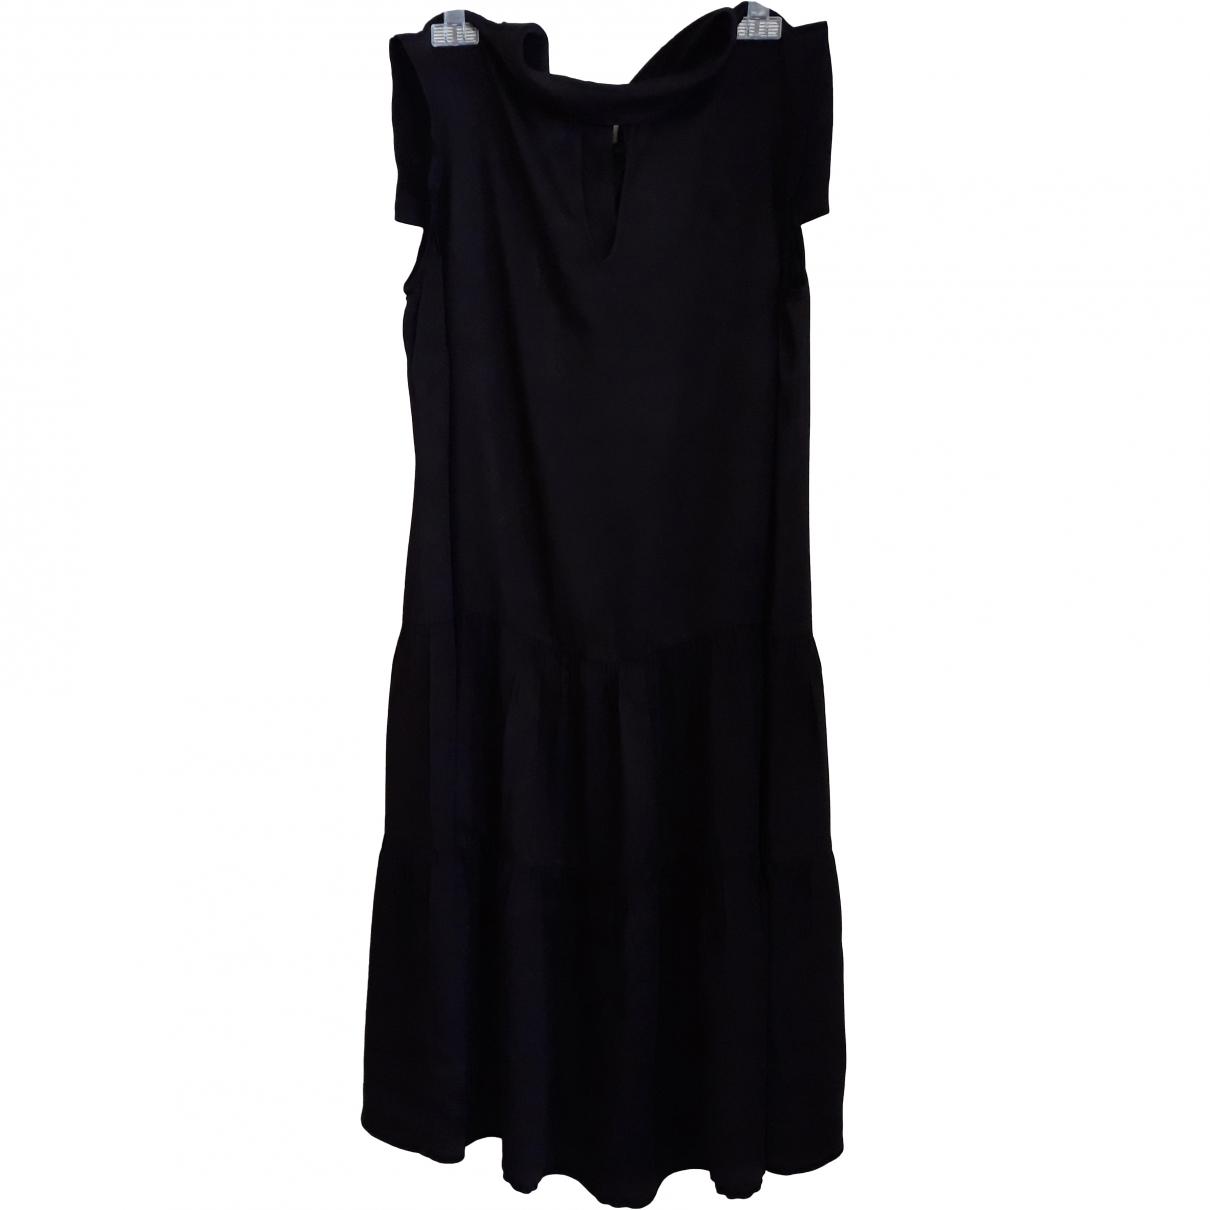 Twin Set \N Black dress for Women M International